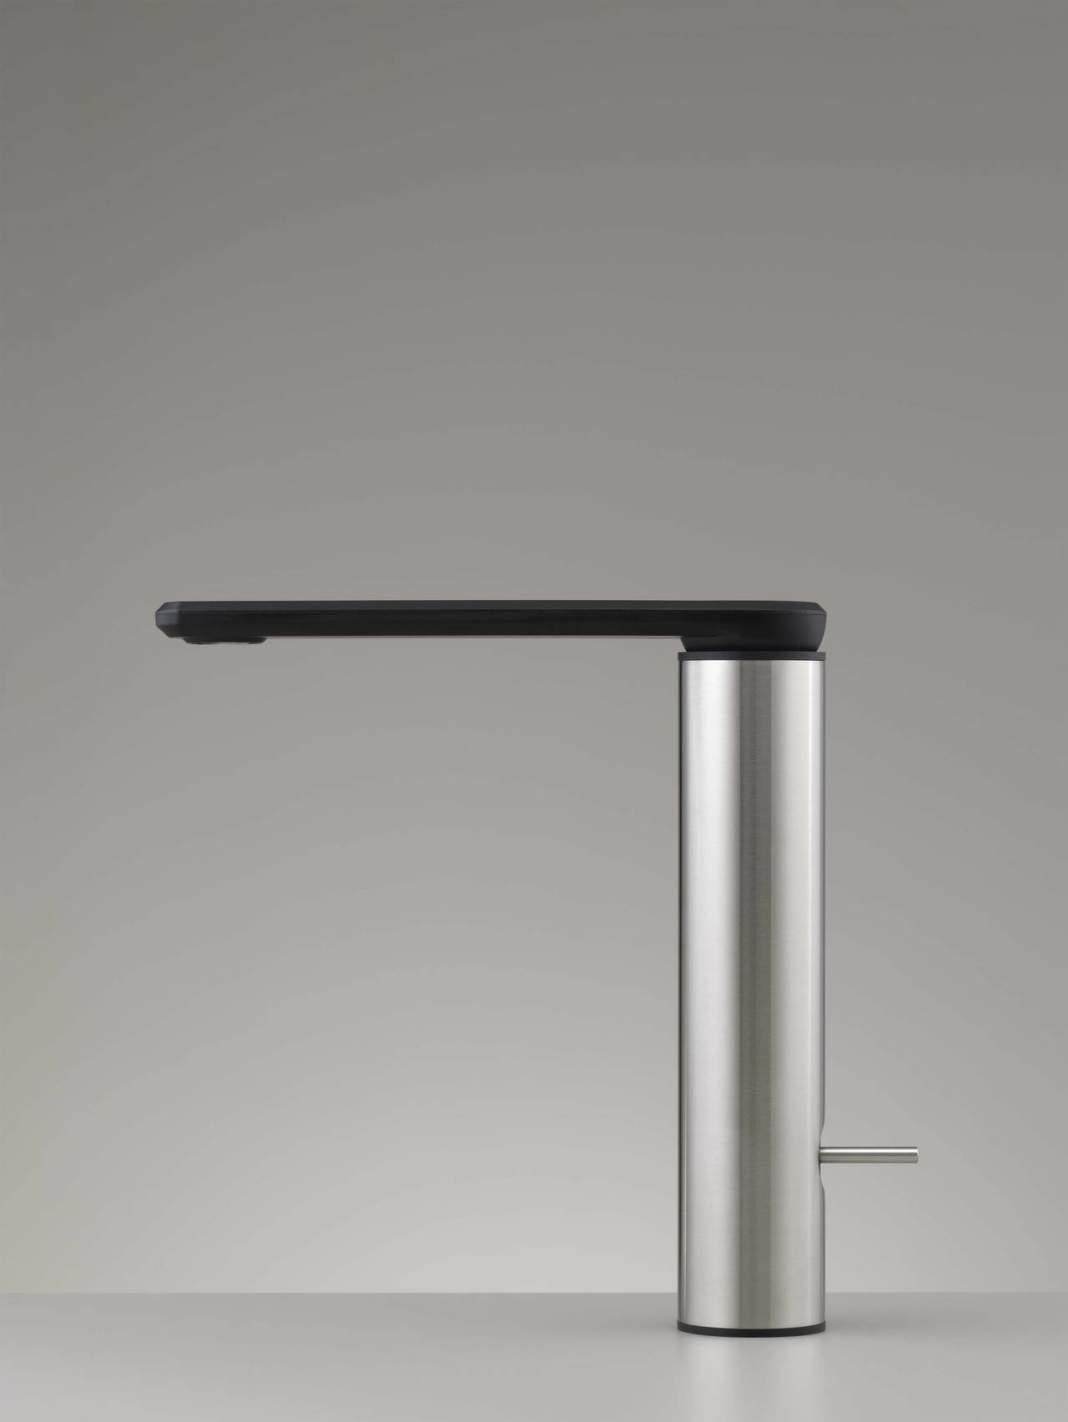 Knee by CEA Design